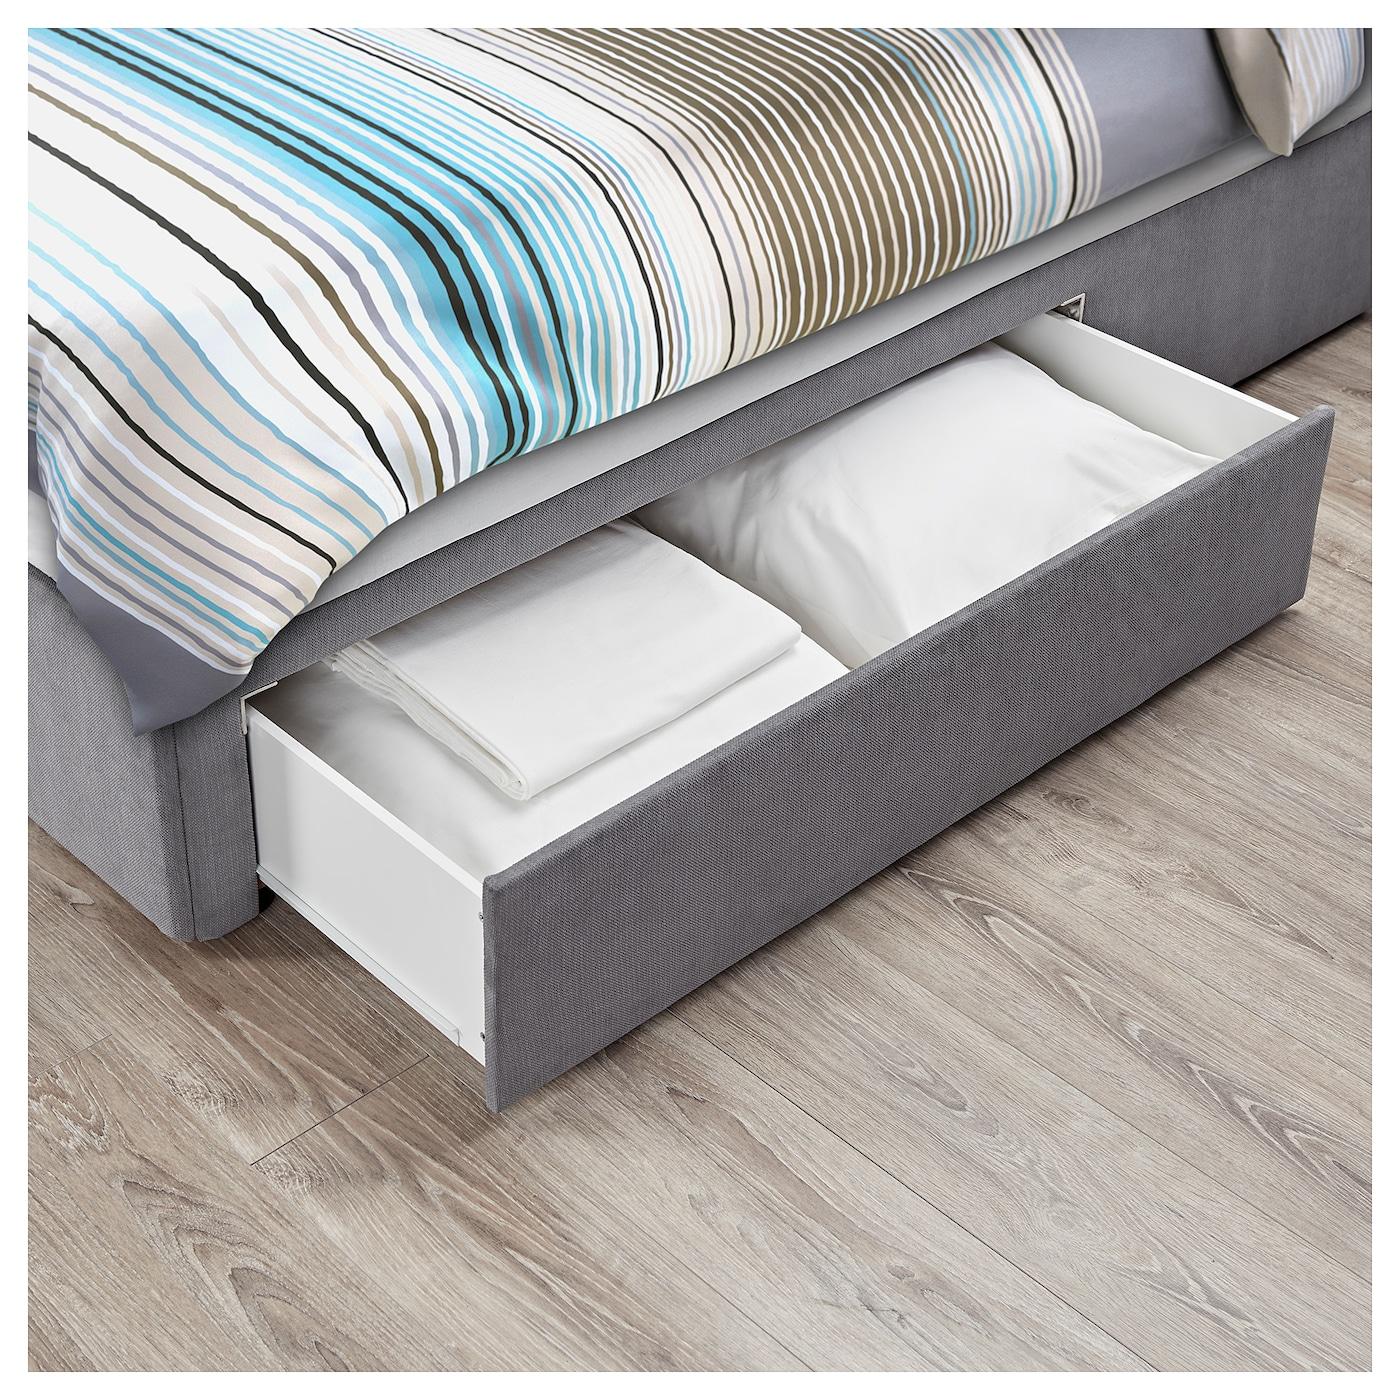 Rugsund divan base with 2 drawers tallmyra grey standard for Divan double bed base with drawers